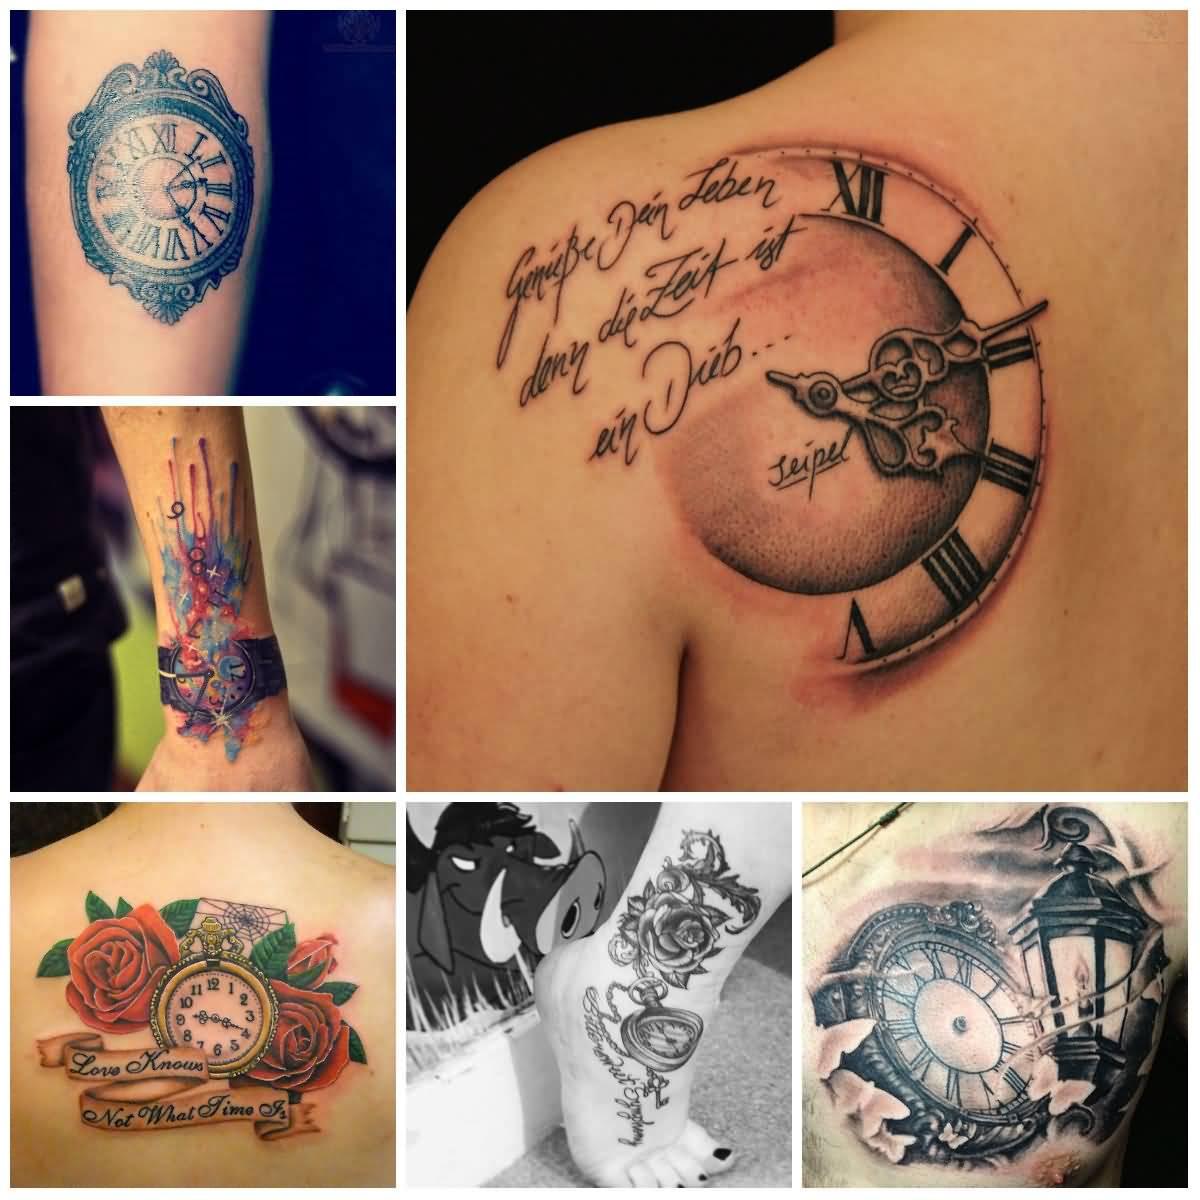 59965a1e78262 32+ Beautiful Clock Tattoos For Girls